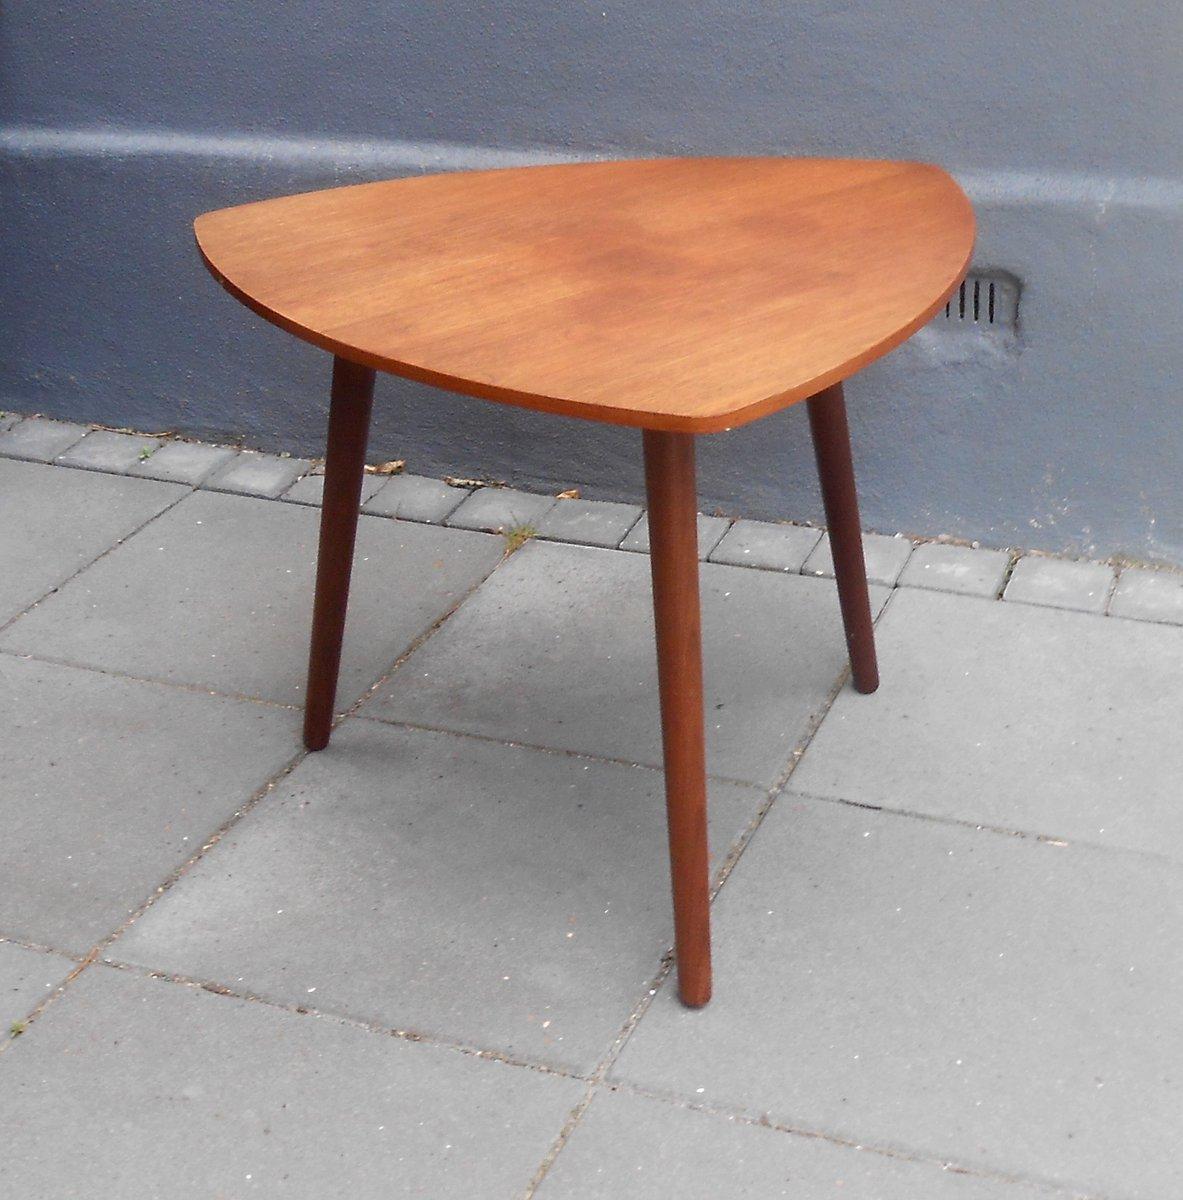 Danish Triangular Guitar Pick Shaped Teak Coffee Table From Mcm 1960s